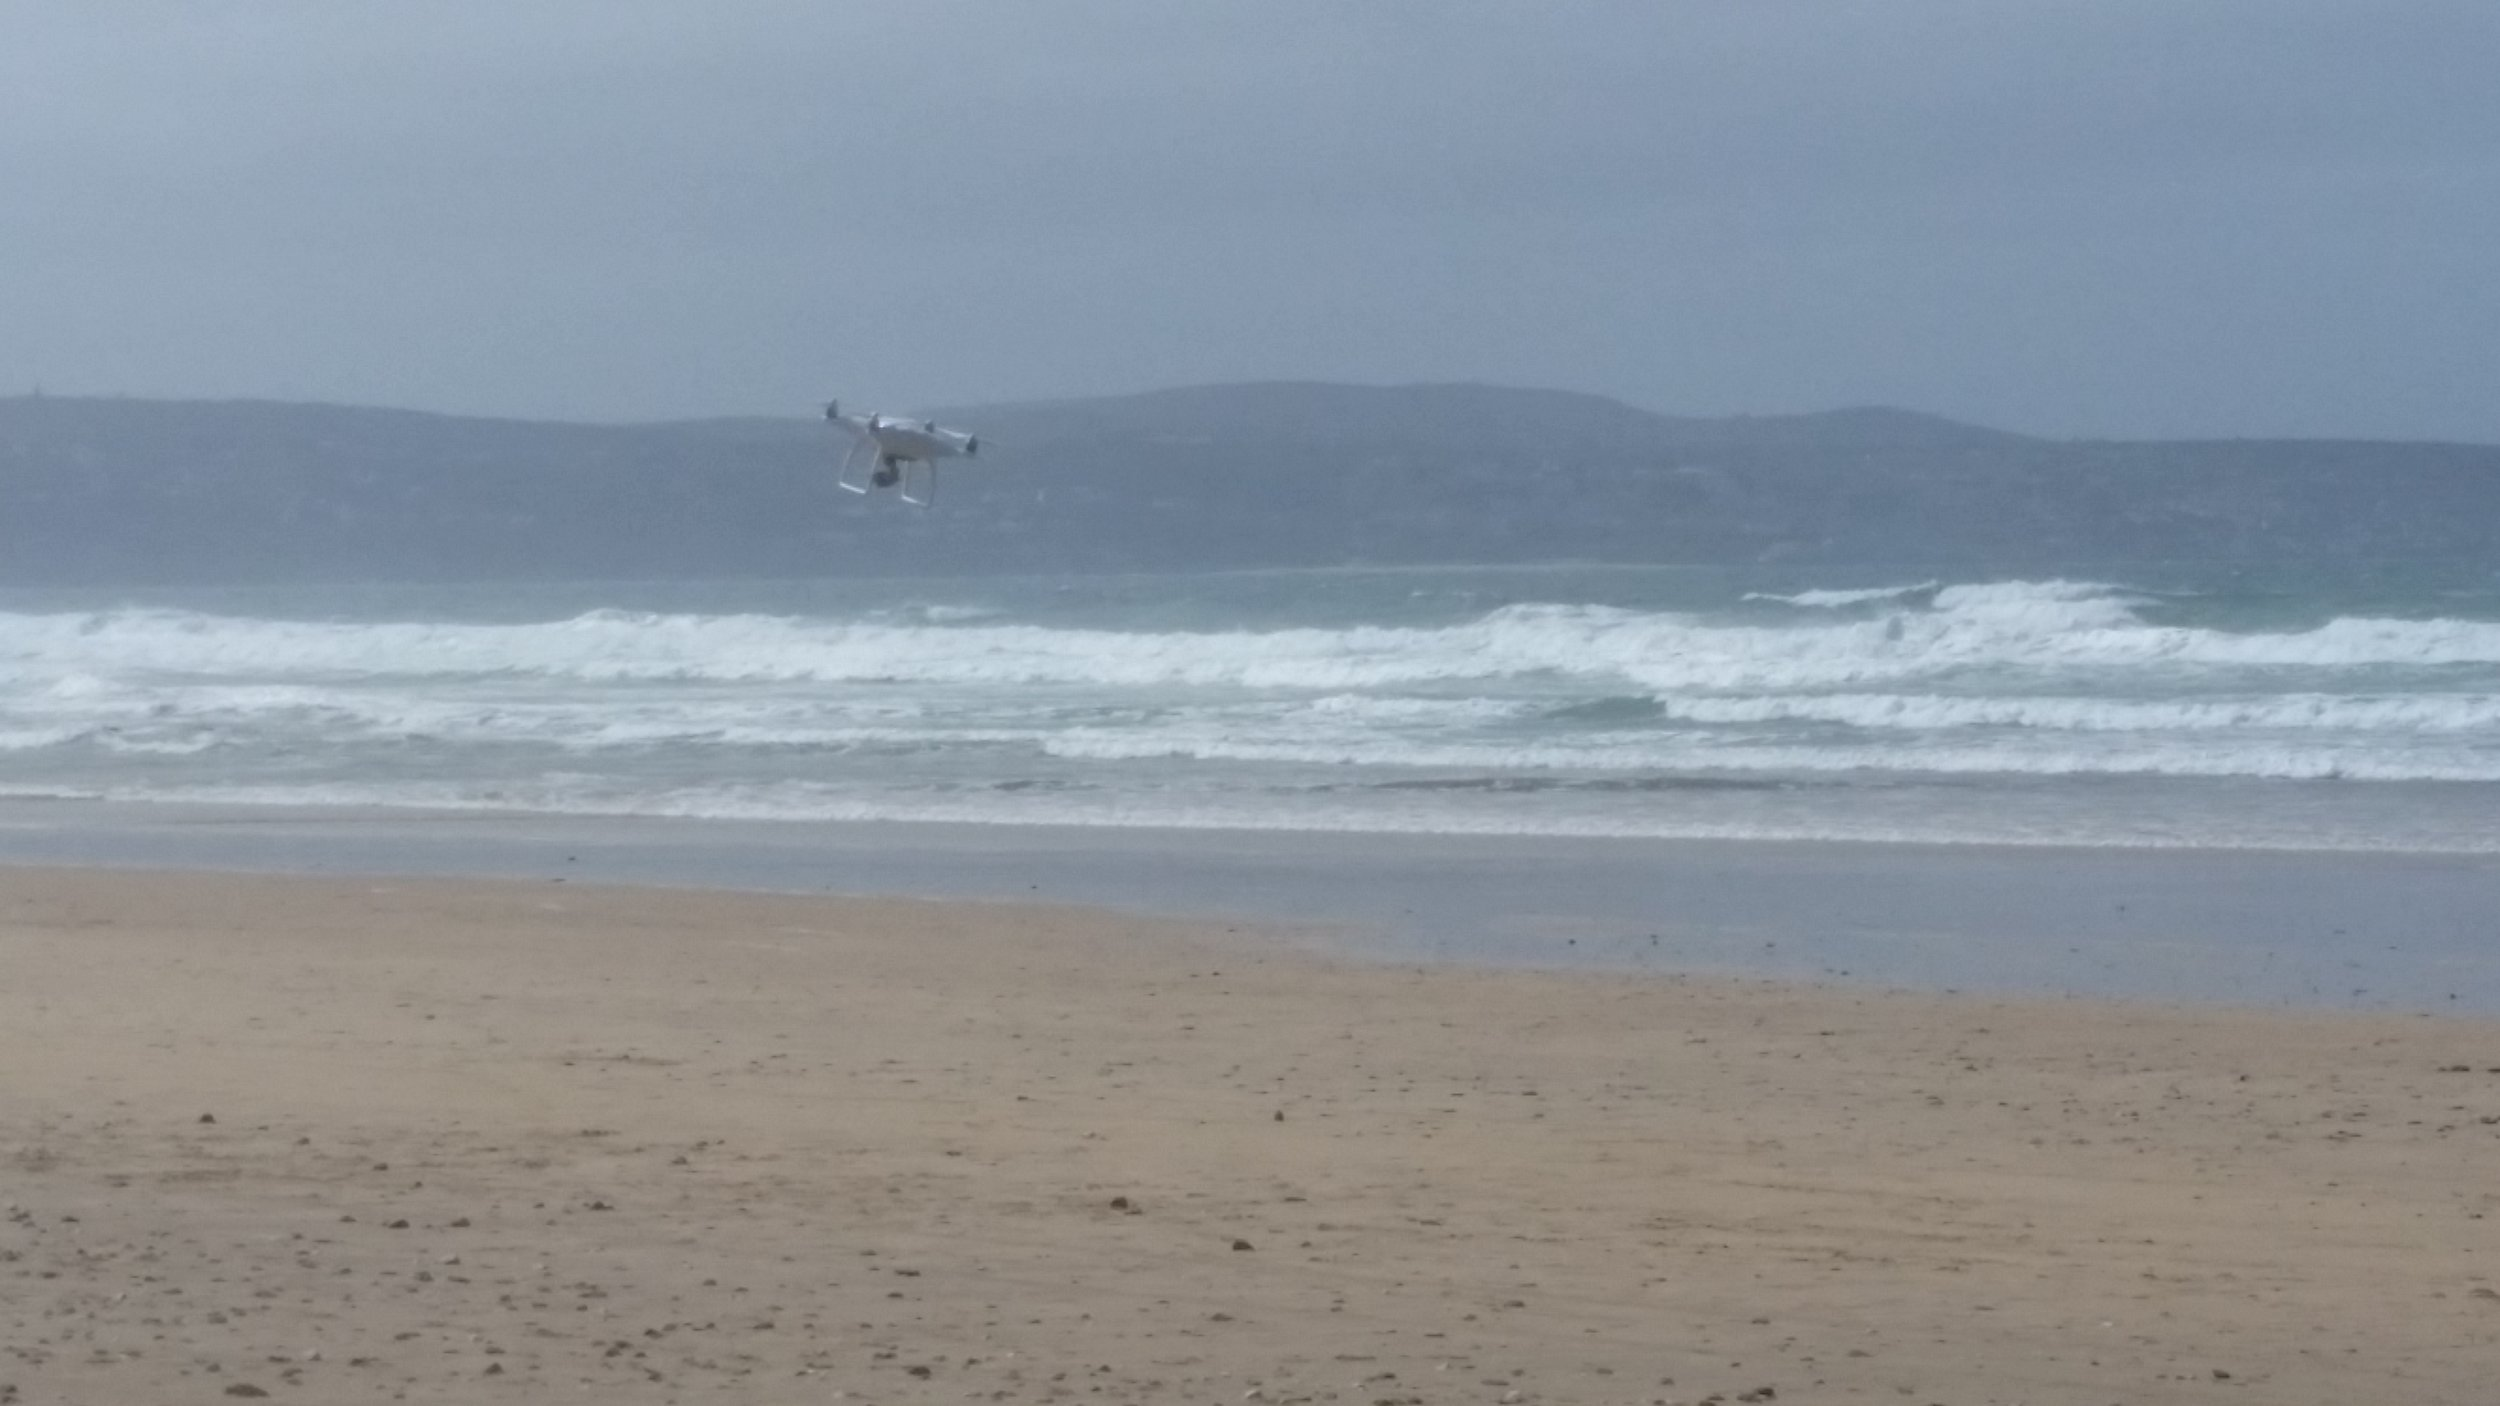 Drones fighting winds